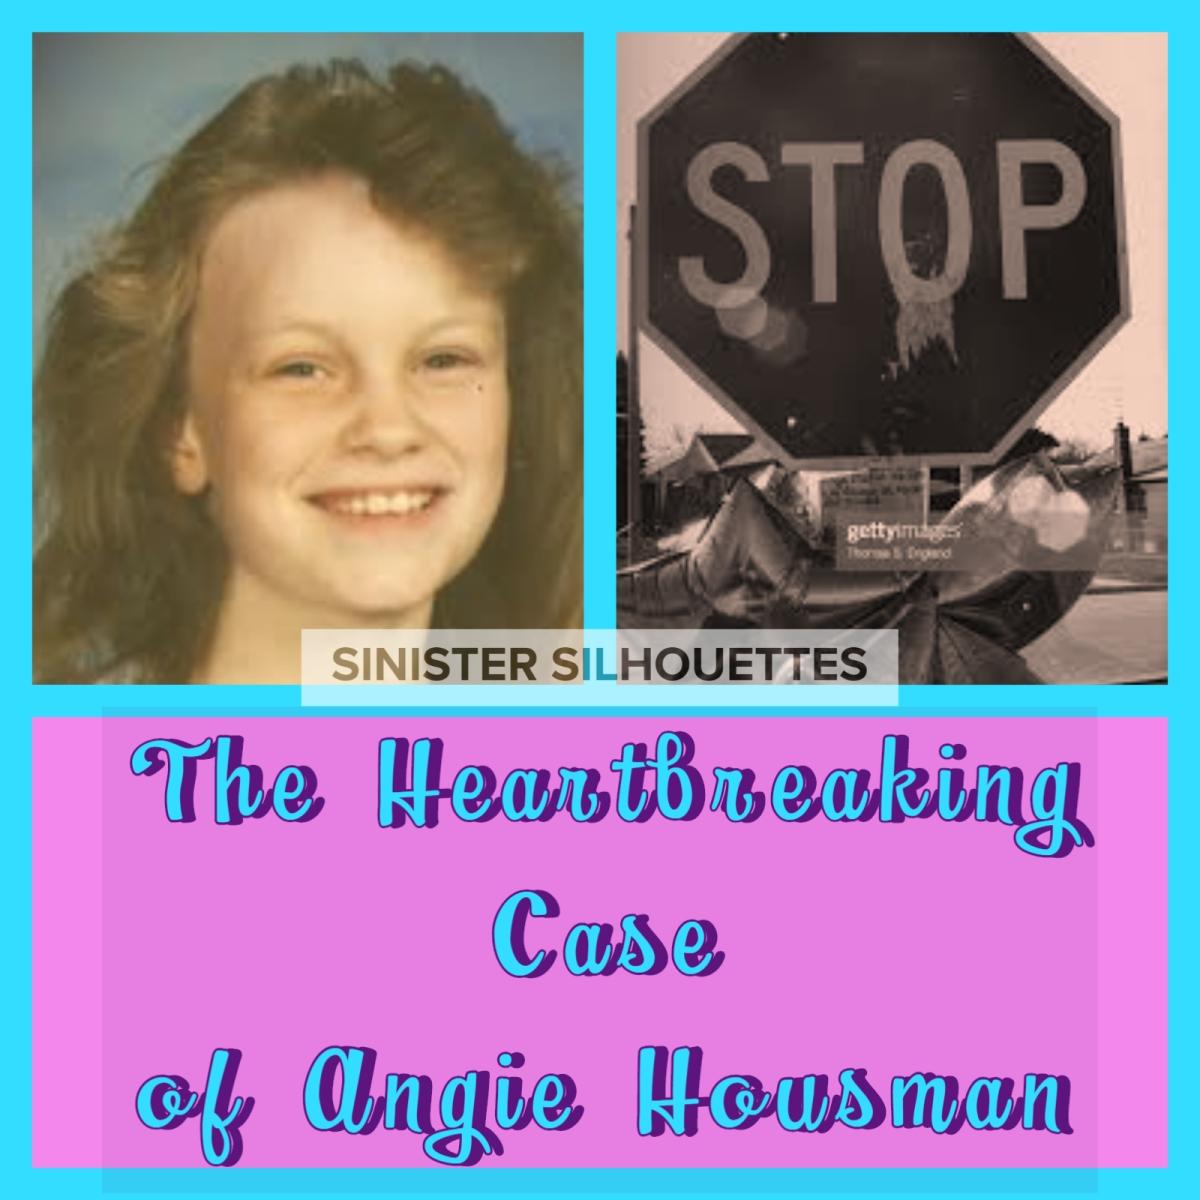 The Heartbreaking Case of AngieHousman